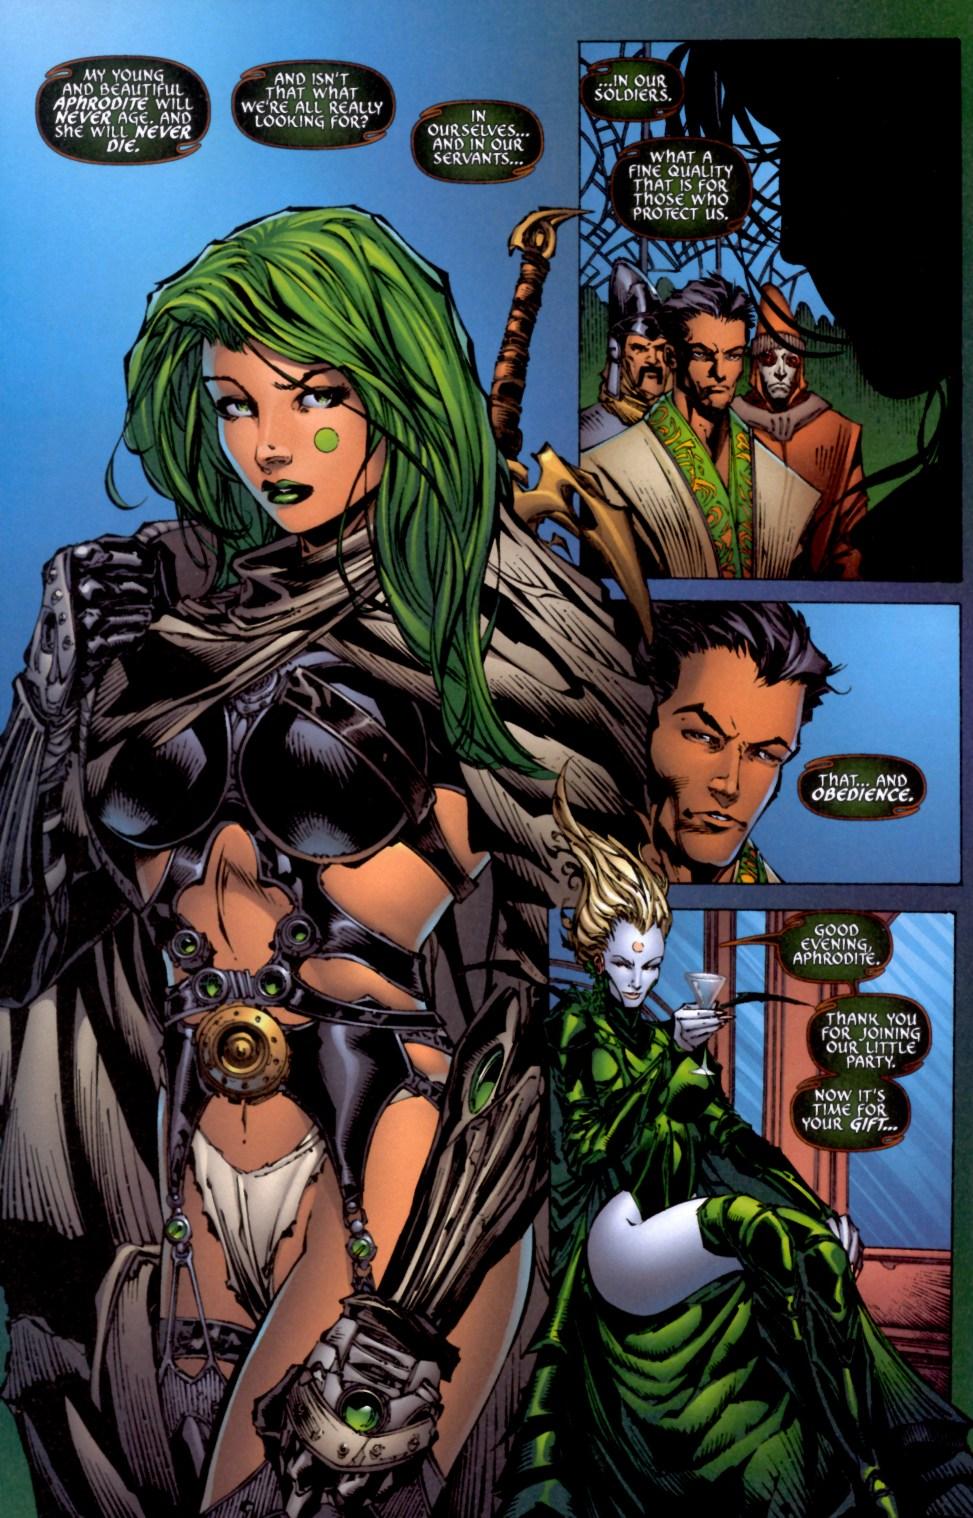 Read online Aphrodite IX (2000) comic -  Issue #4 - 27